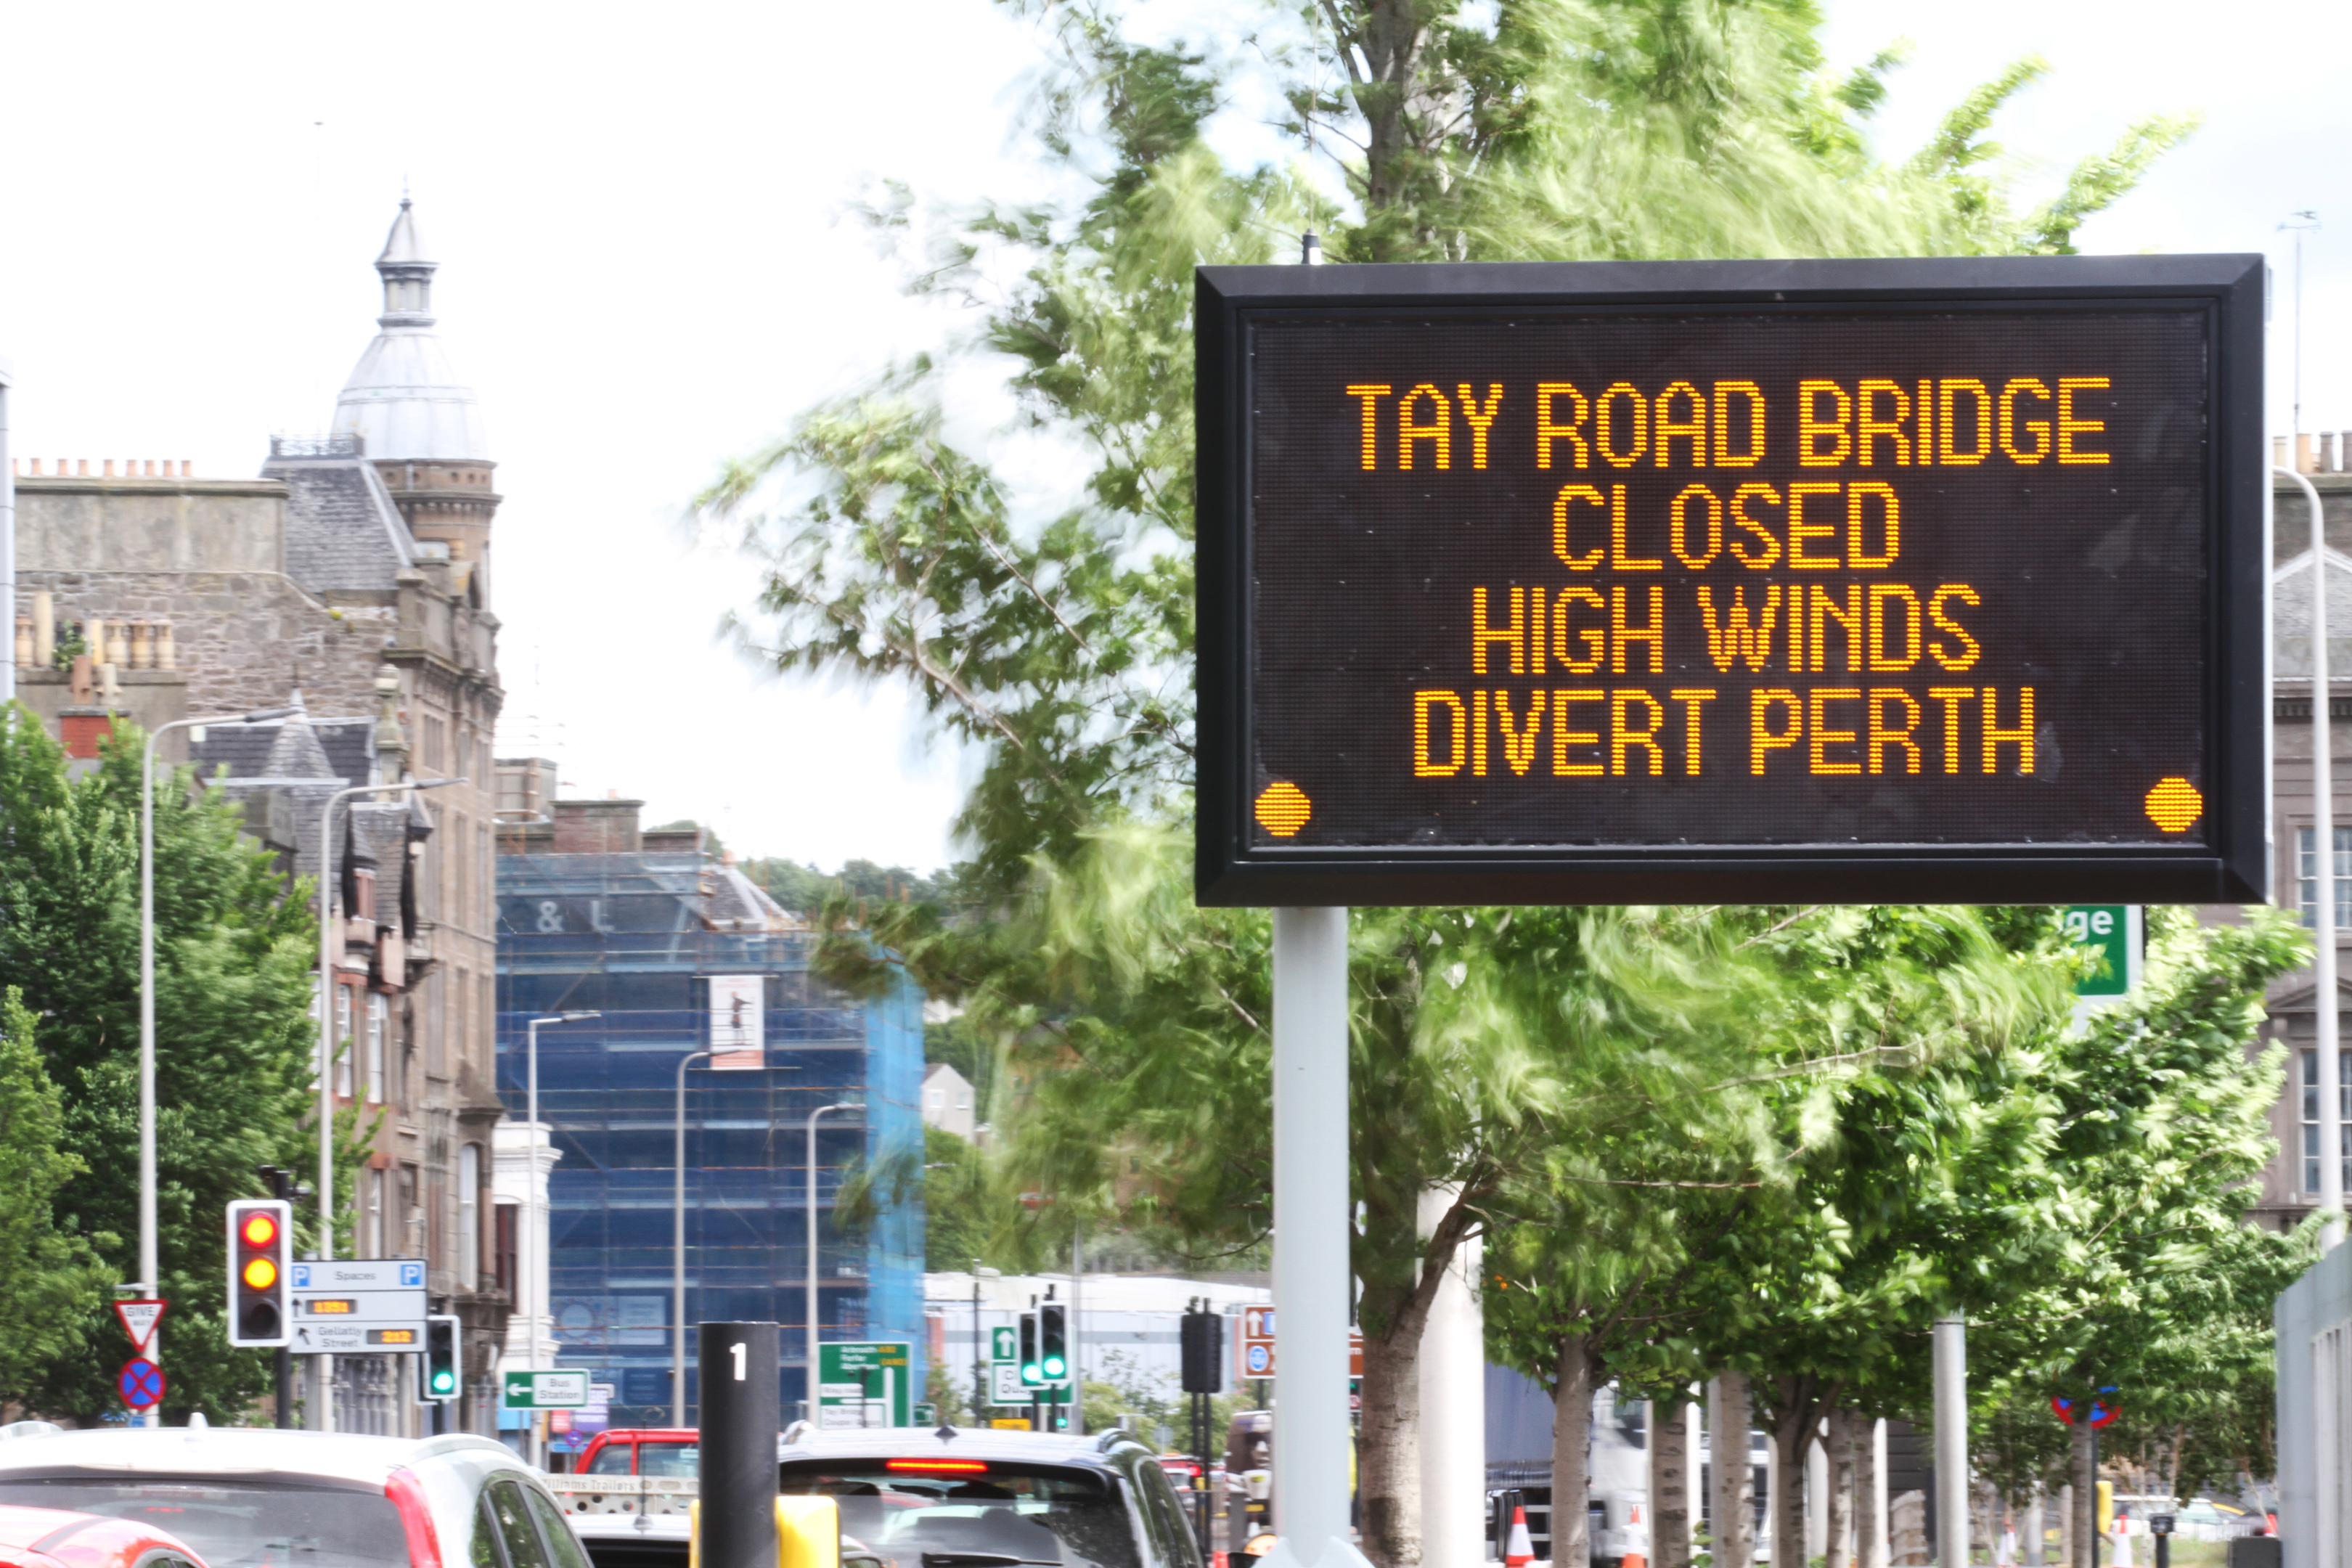 High winds closed the Tay Road Bridge.